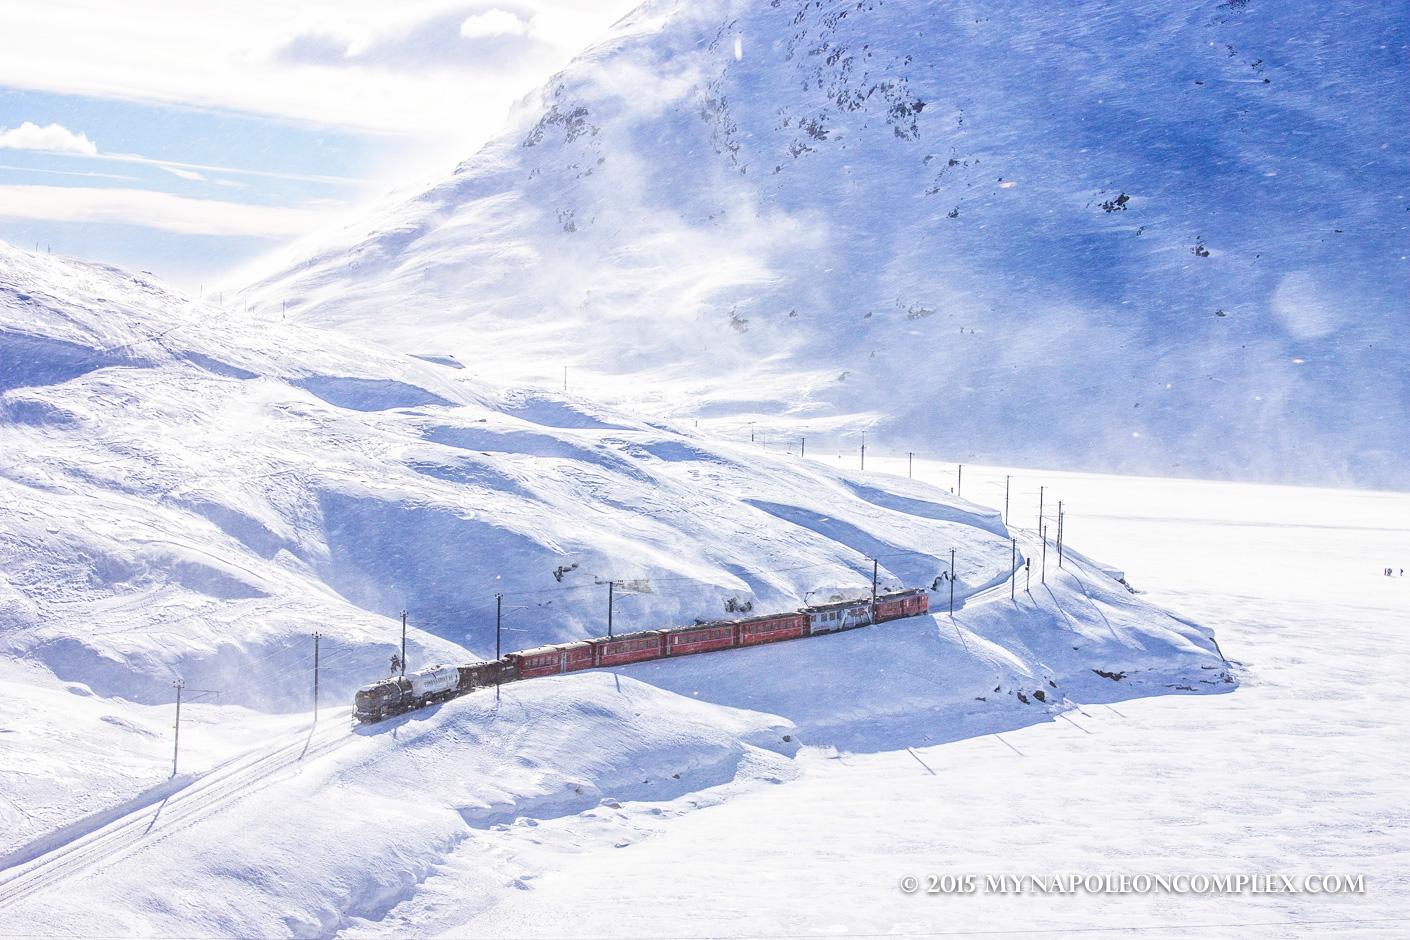 St. Moritz & the Rhaetian Railway